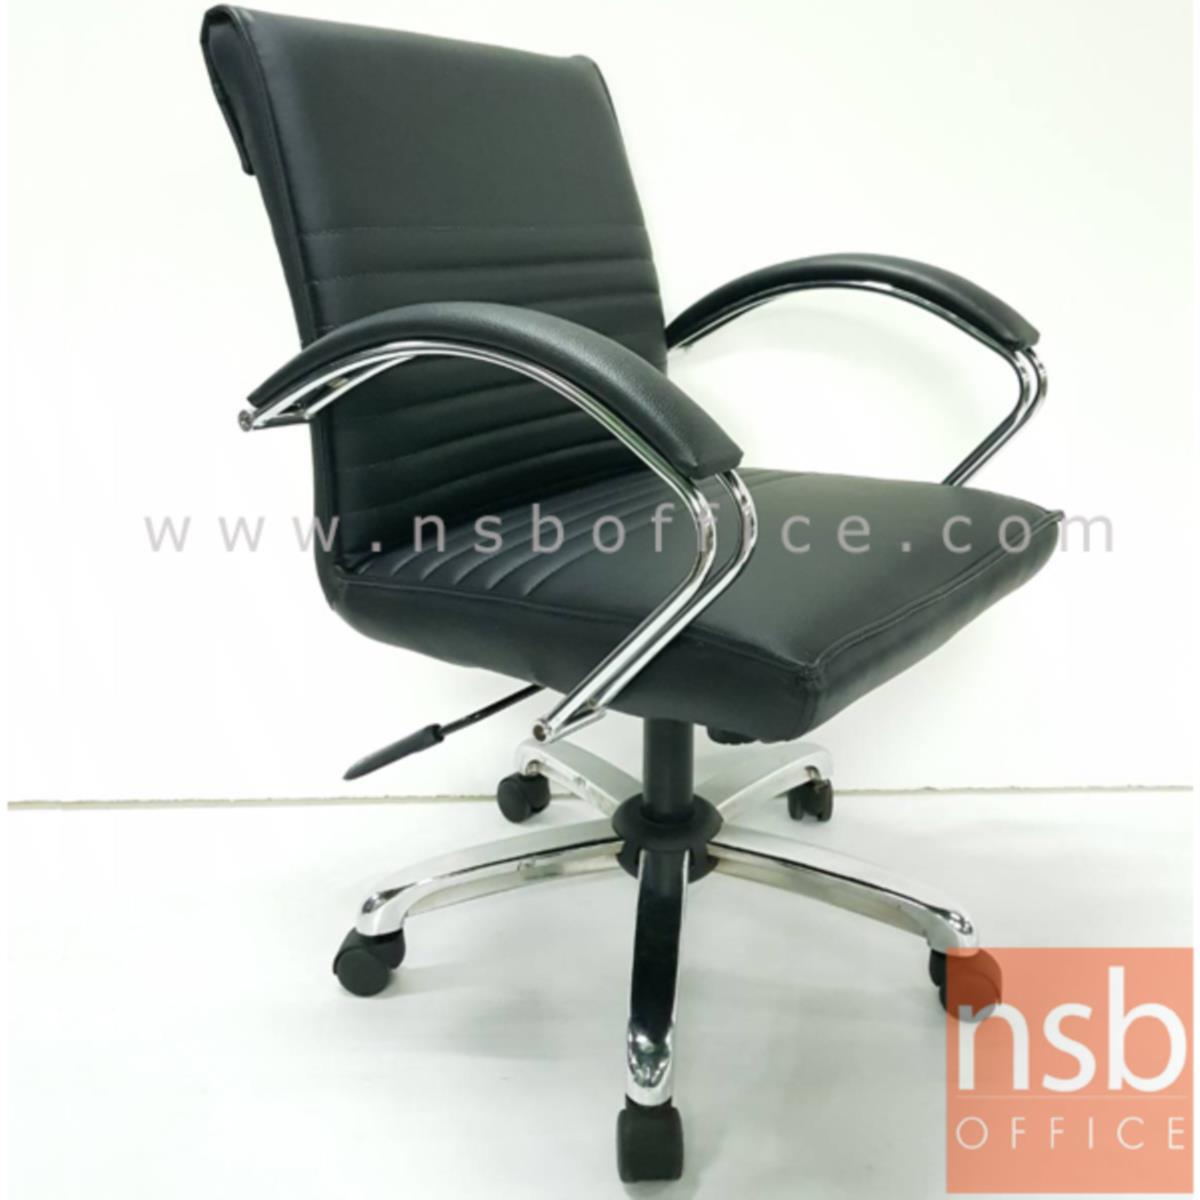 B03A414:เก้าอี้สำนักงาน รุ่น SK-40  โช๊คแก๊ส ขาเหล็กชุบโครเมี่ยม